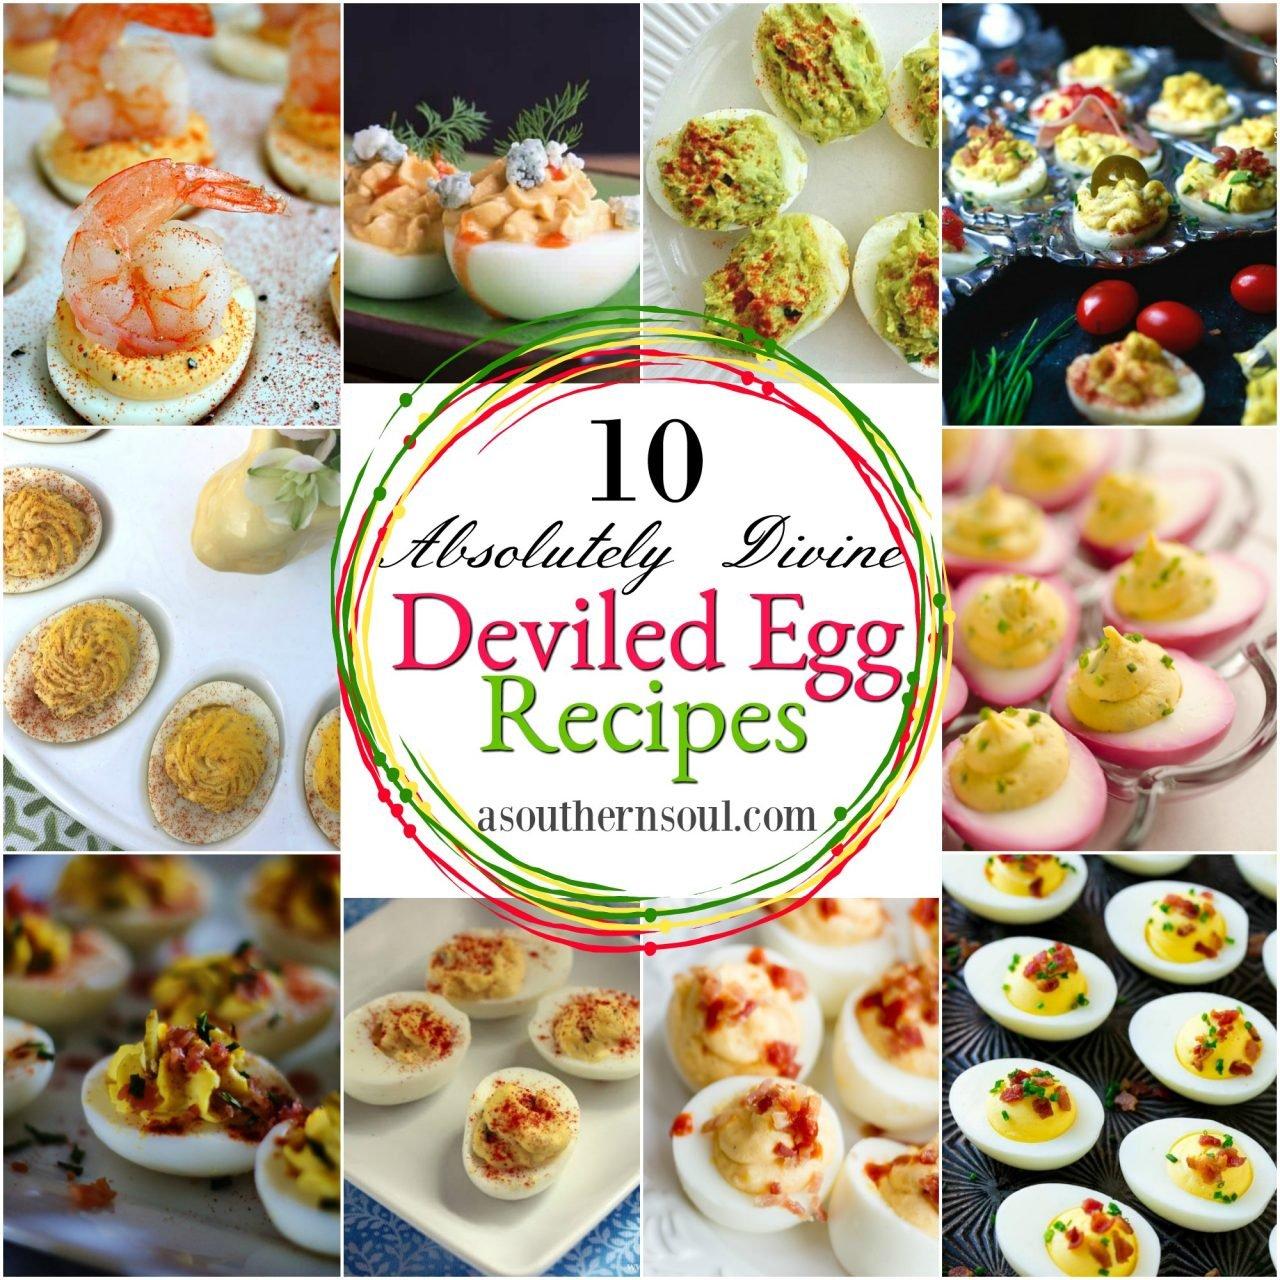 10 Absolutely Divine Deviled Egg Recipes